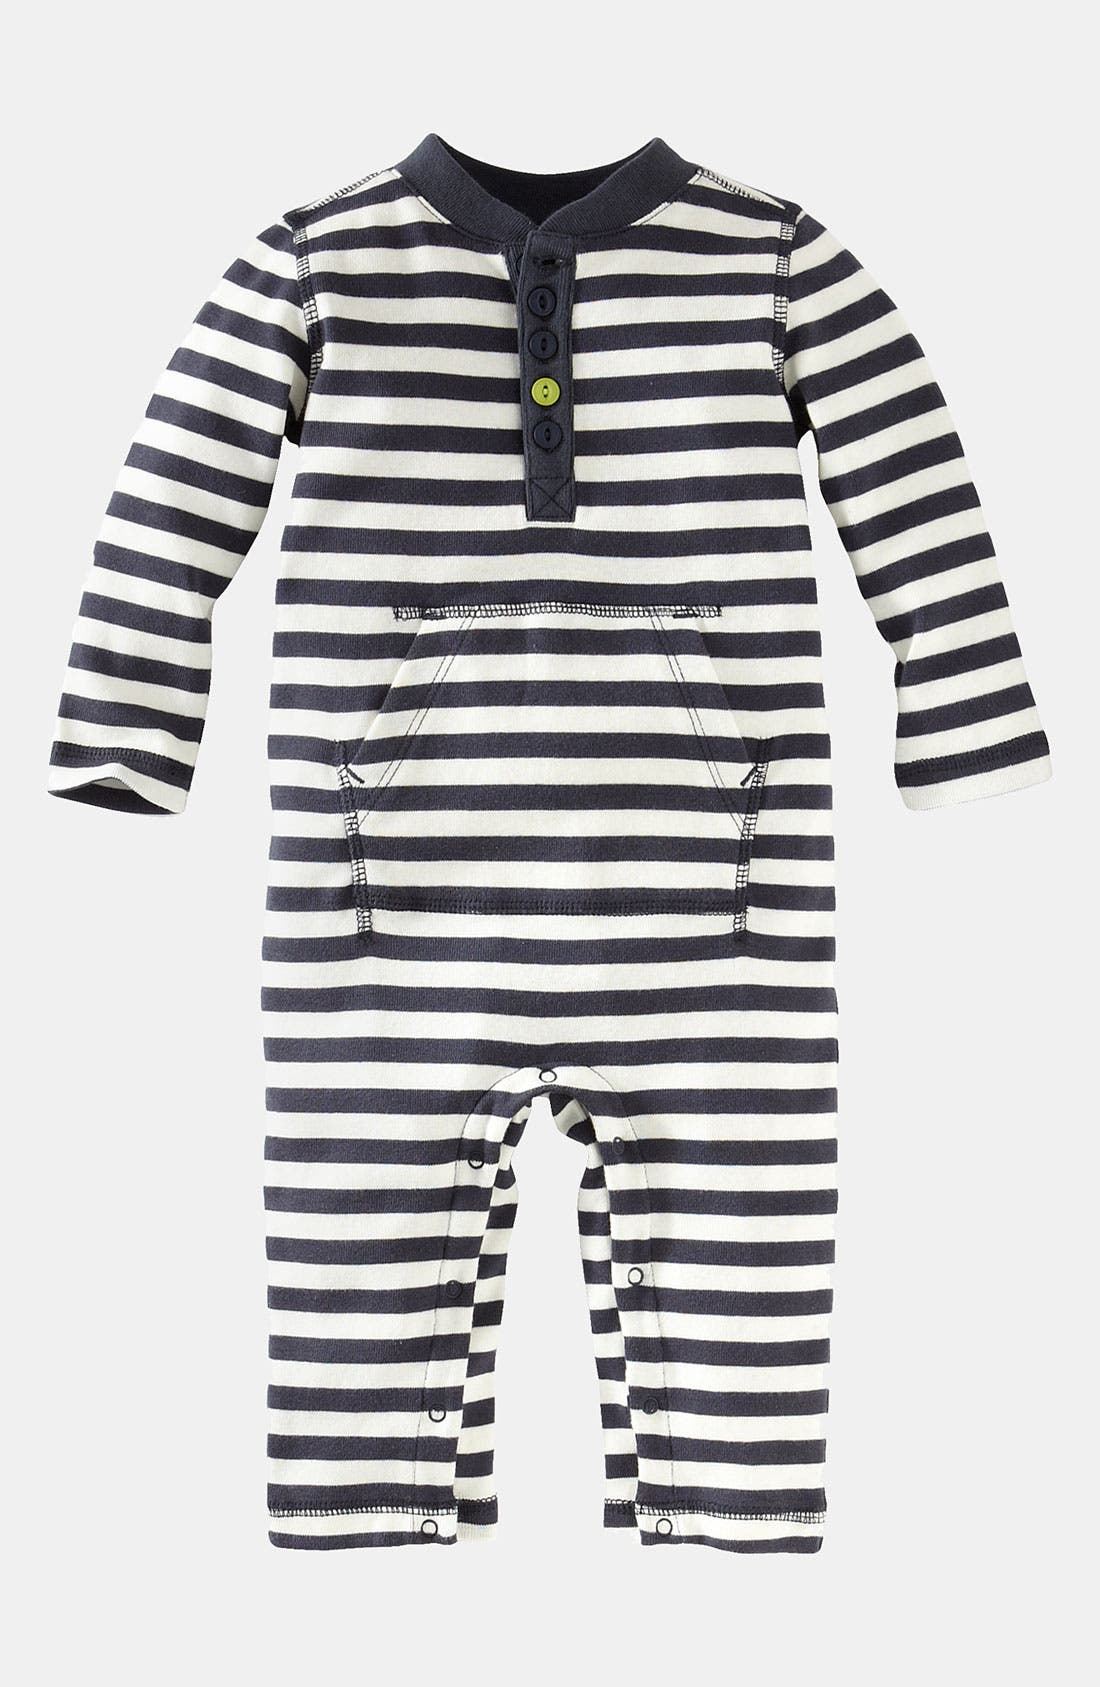 Alternate Image 1 Selected - Tea Collection 'Vilakazi' Stripe Henley Romper (Infant)